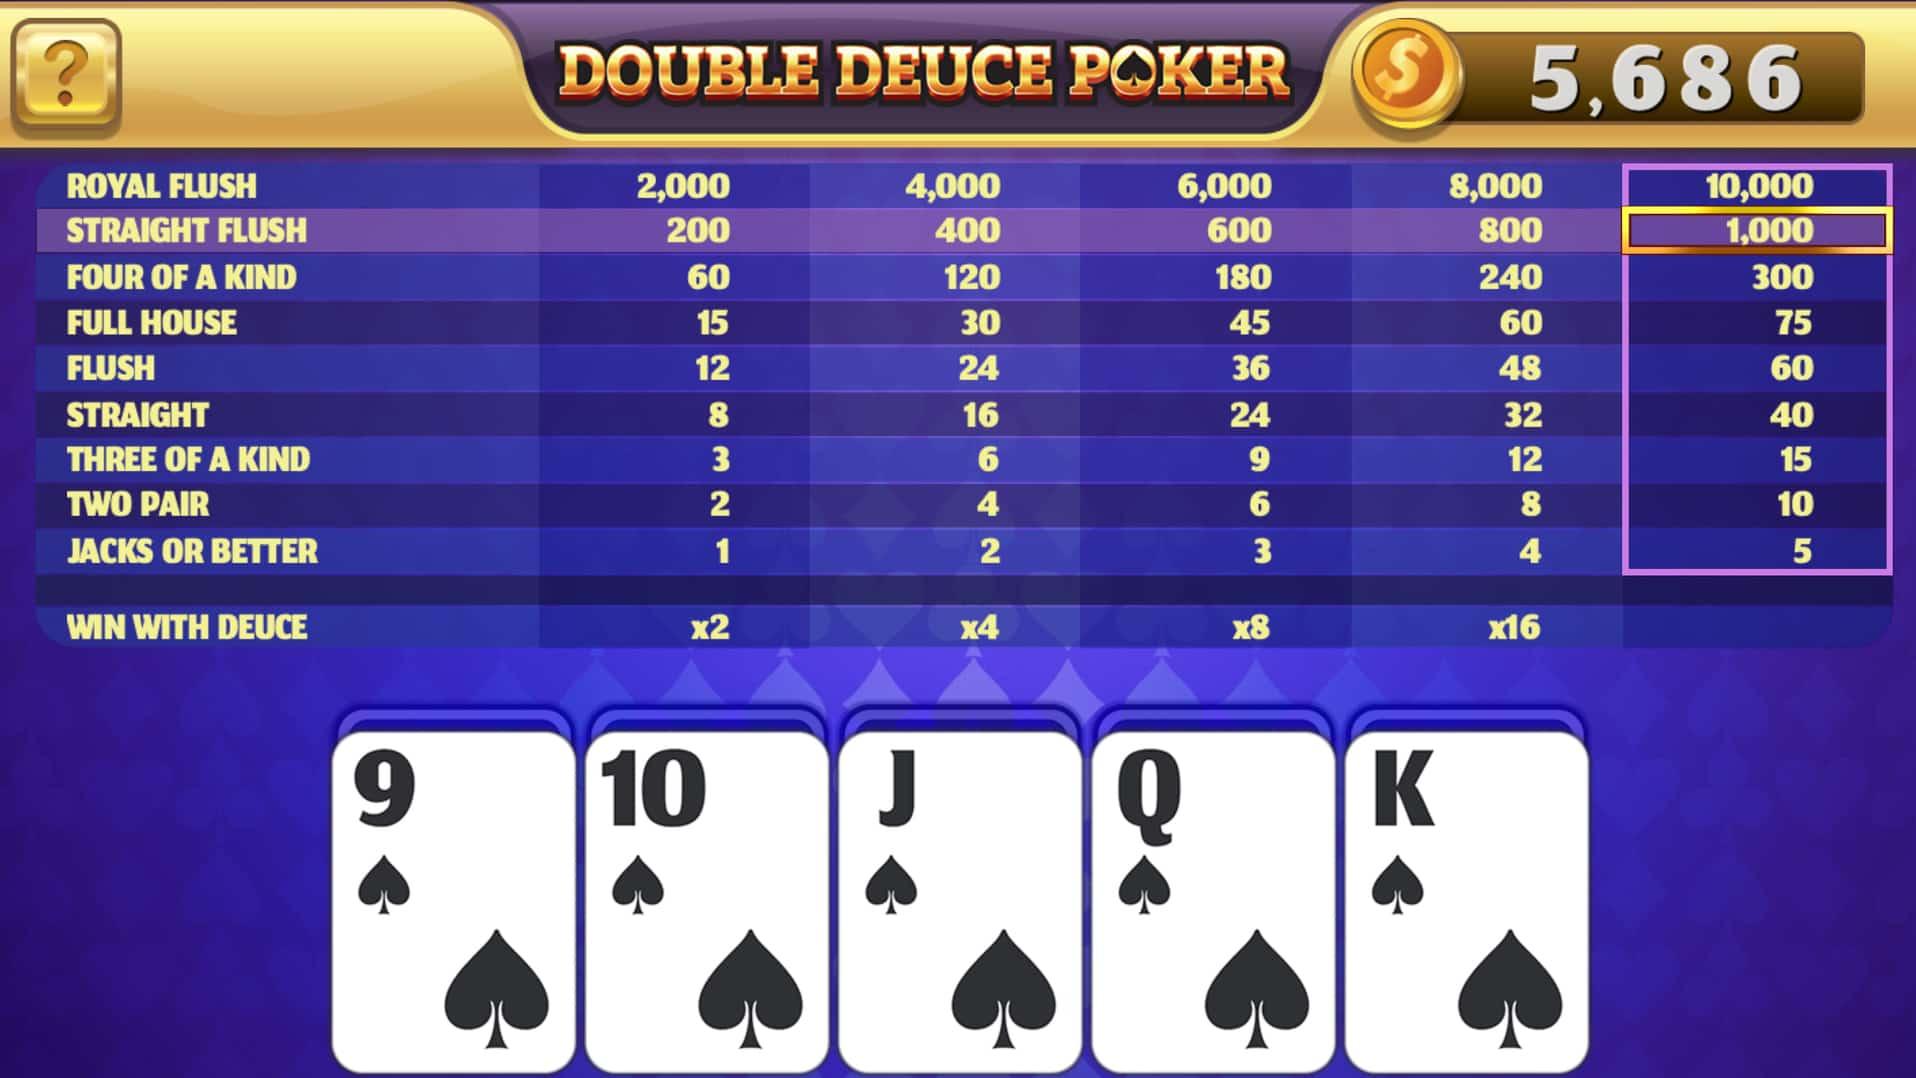 Ladbrokes mobile casino no deposit bonus